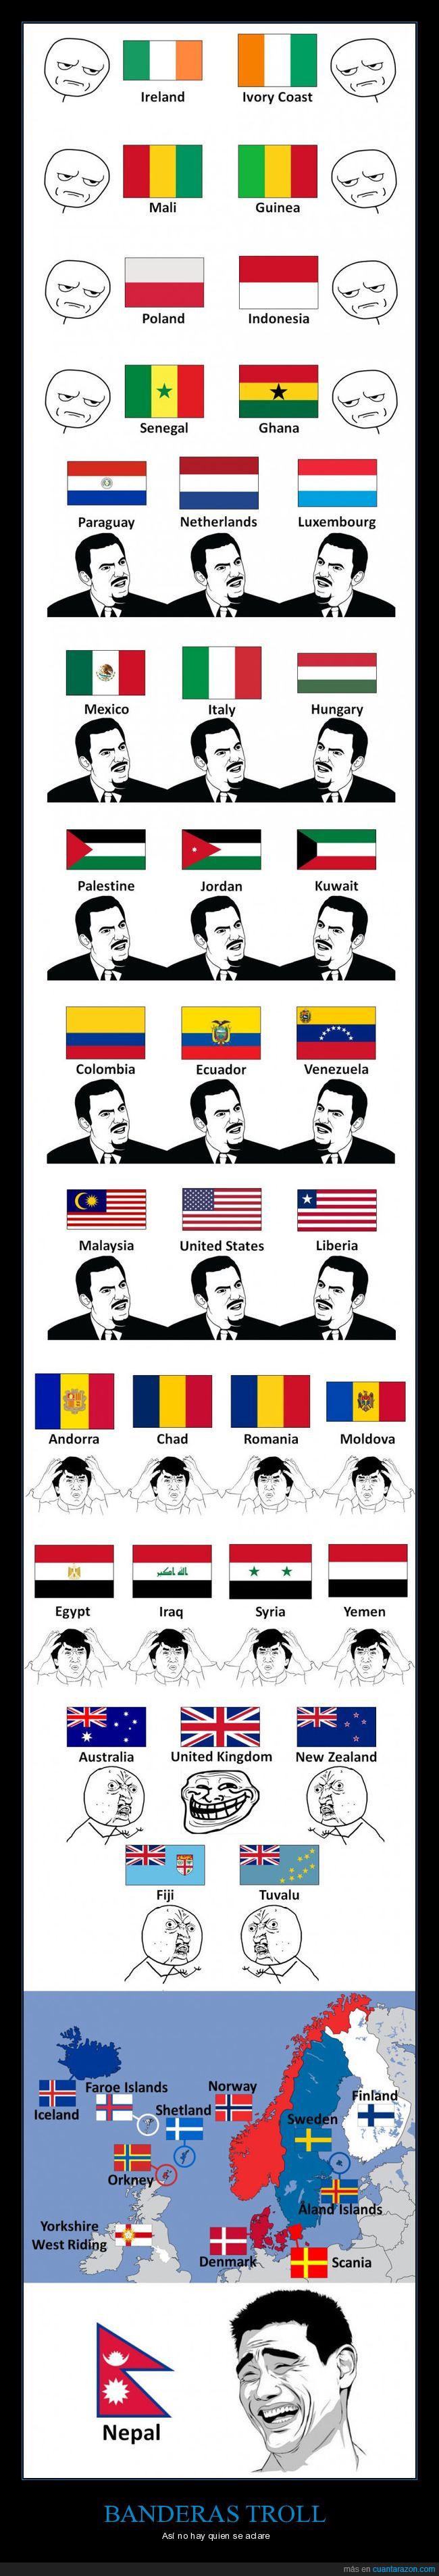 banderas,países,parecidas,troll